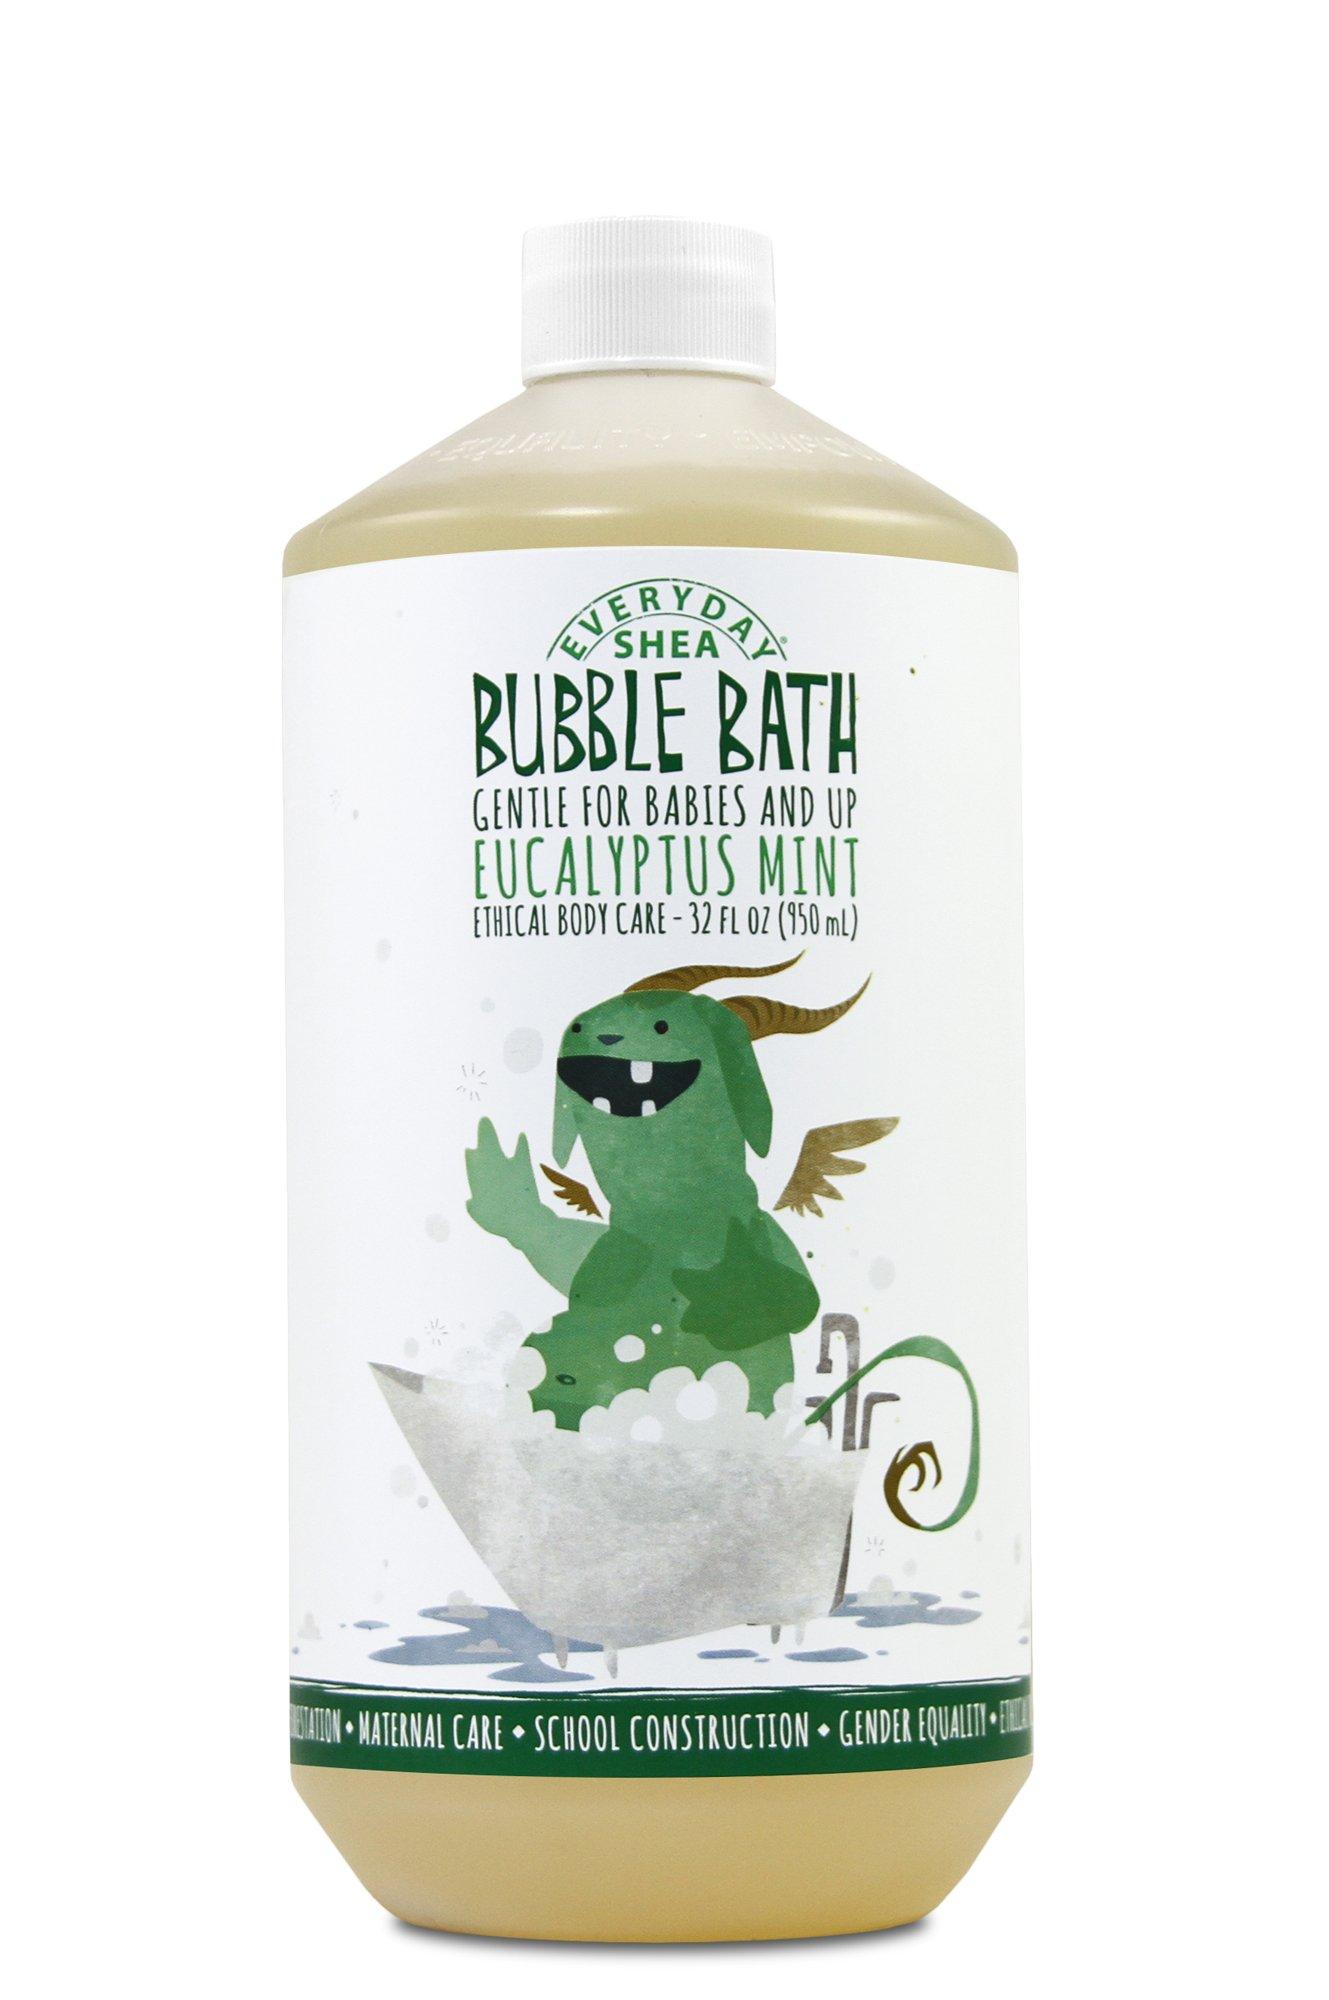 Alaffia - Everyday Shea Bubble Bath, Babies and Kids, Gentle Support to Clean, Moisturize, and Calm with Shea Butter, Lemon Balm, and Spearmint, Fair Trade, Eucalyptus Mint, 32 Ounces (FFP)